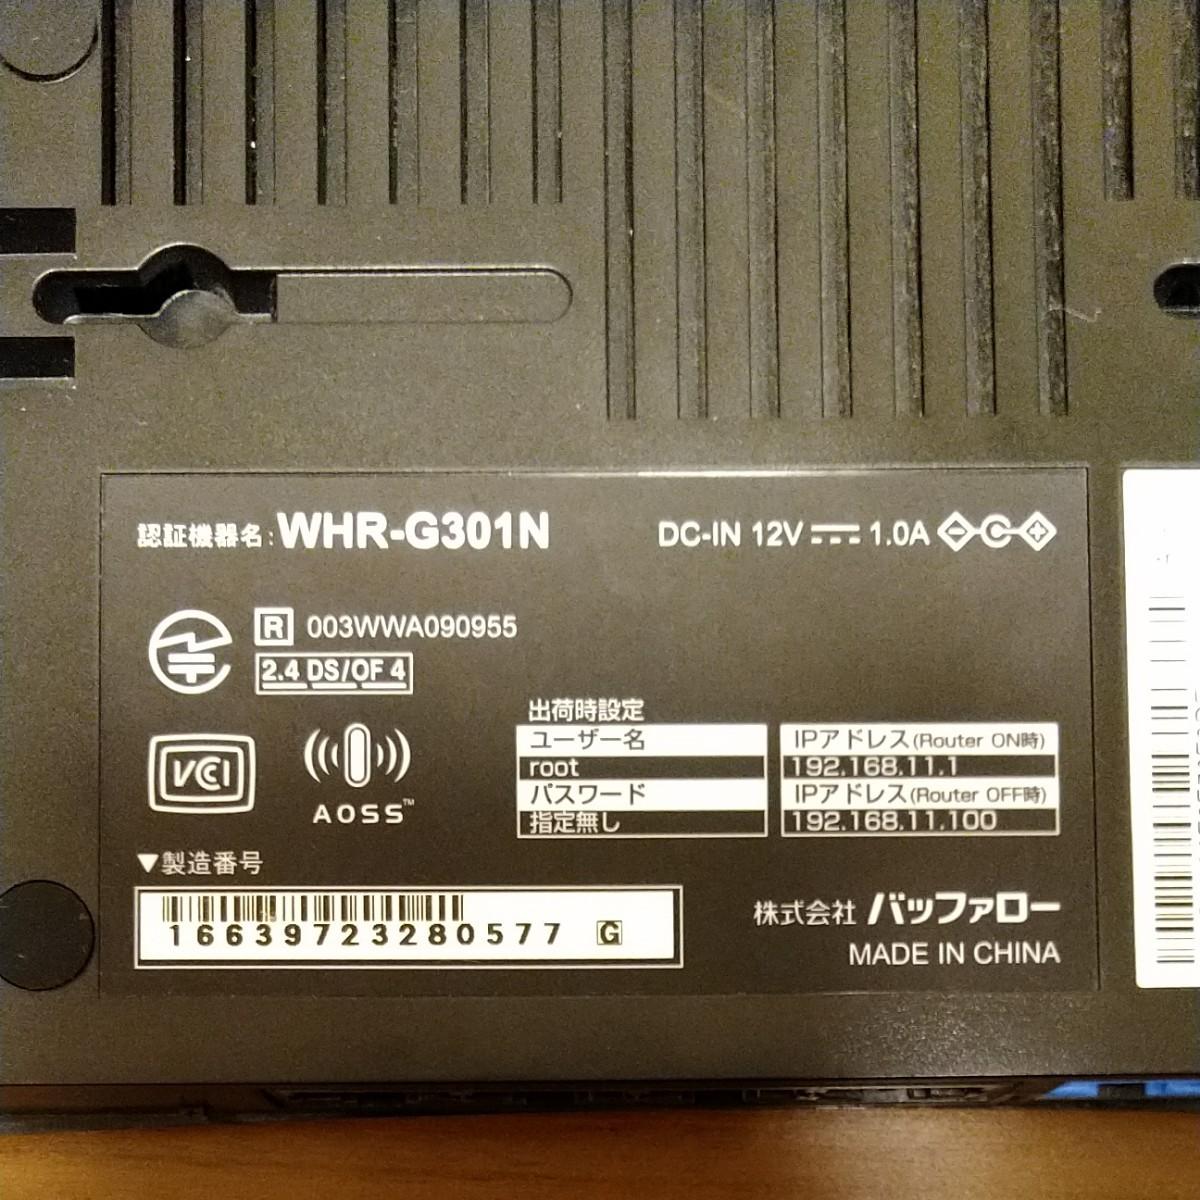 BUFFALO WHR-G301N 無線LANルーター バッファロー 動作確認済み